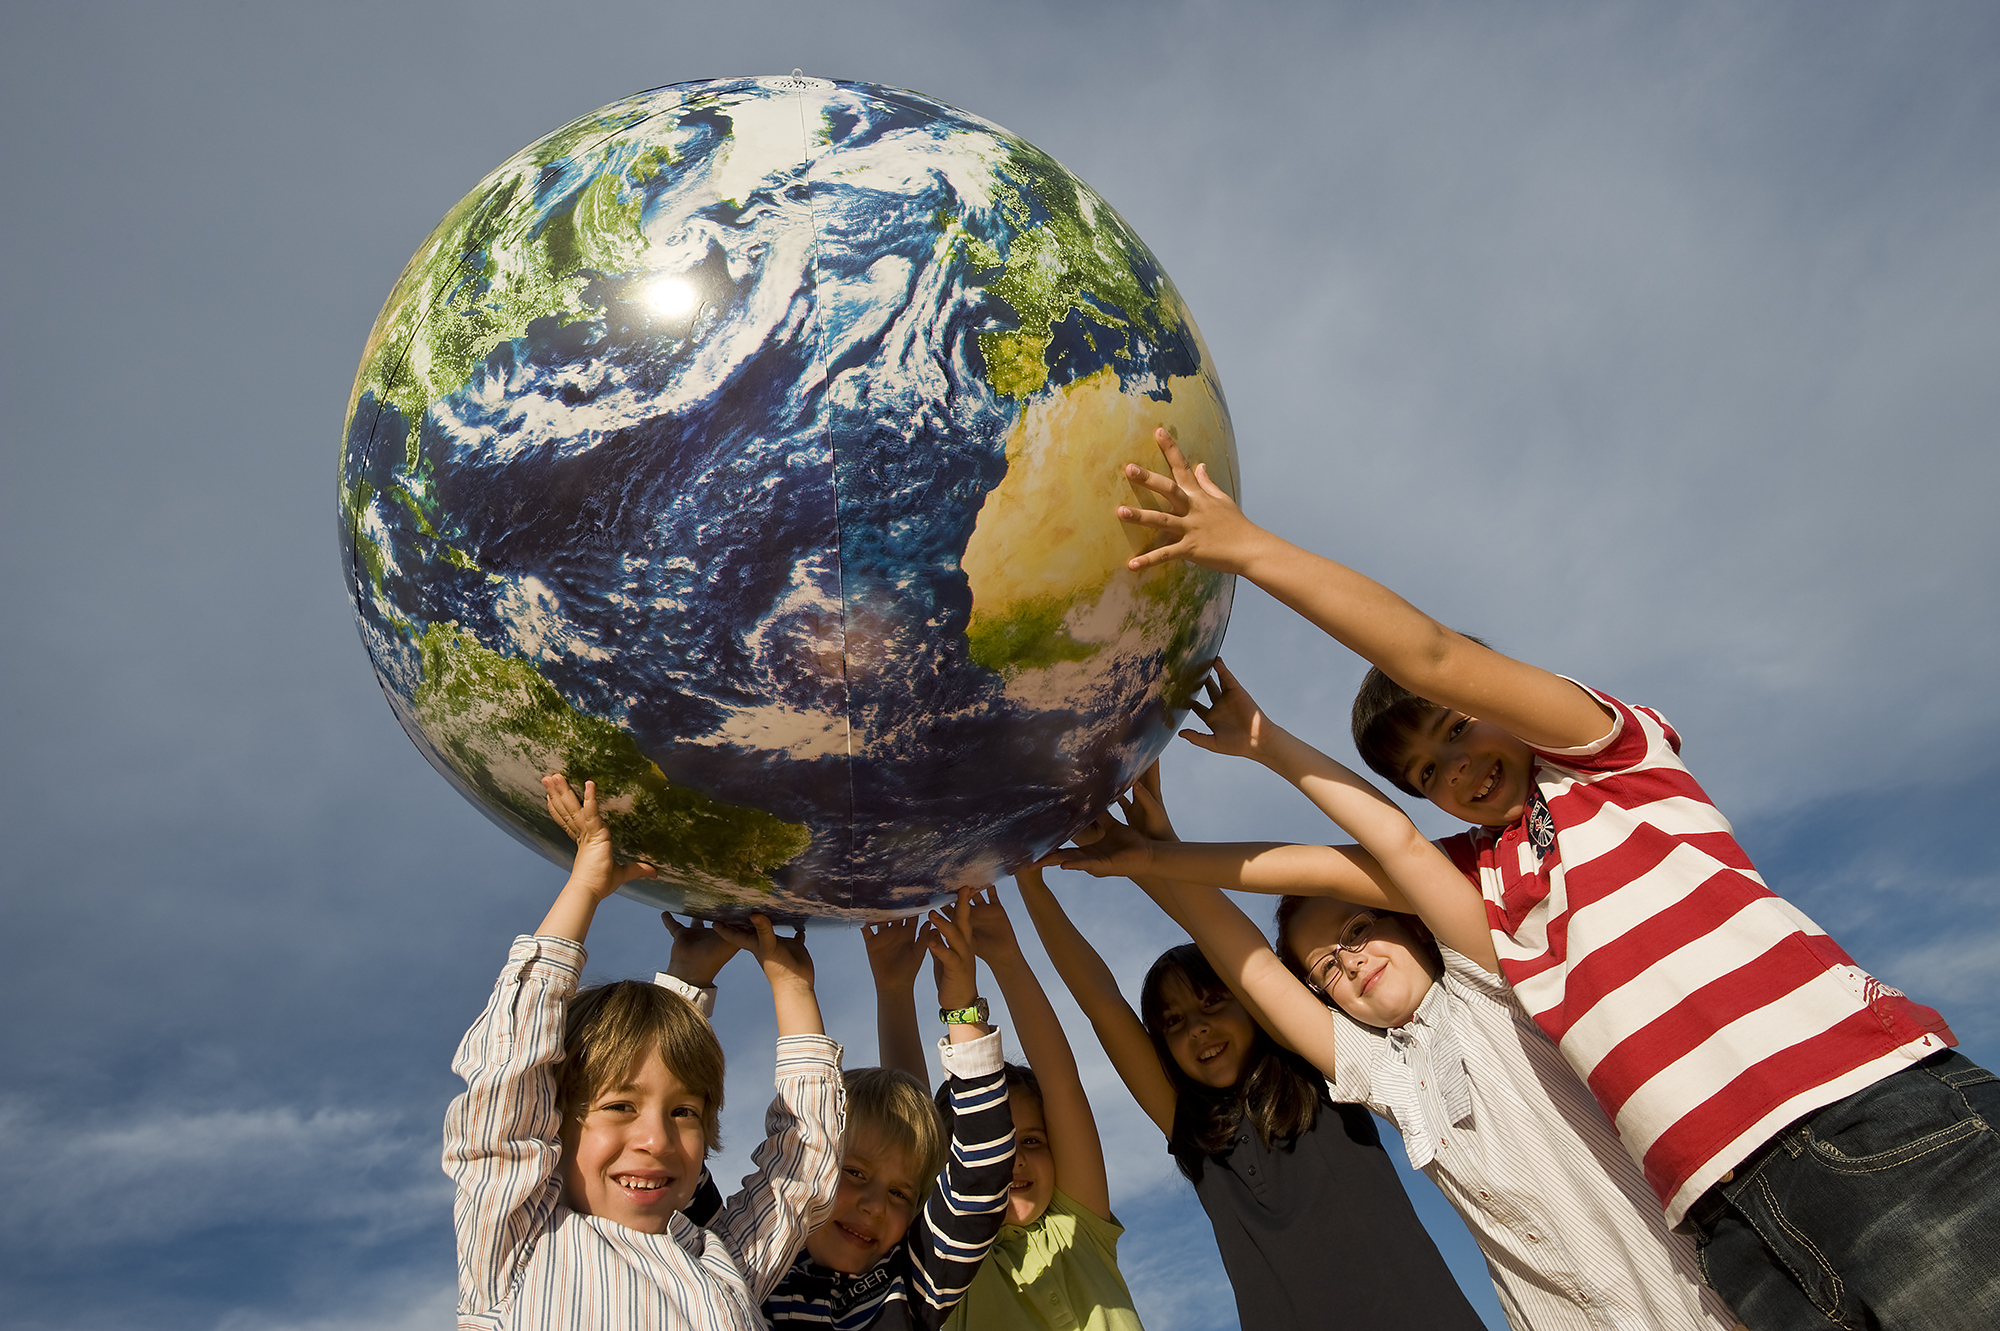 Start kampanii Energia odNowa